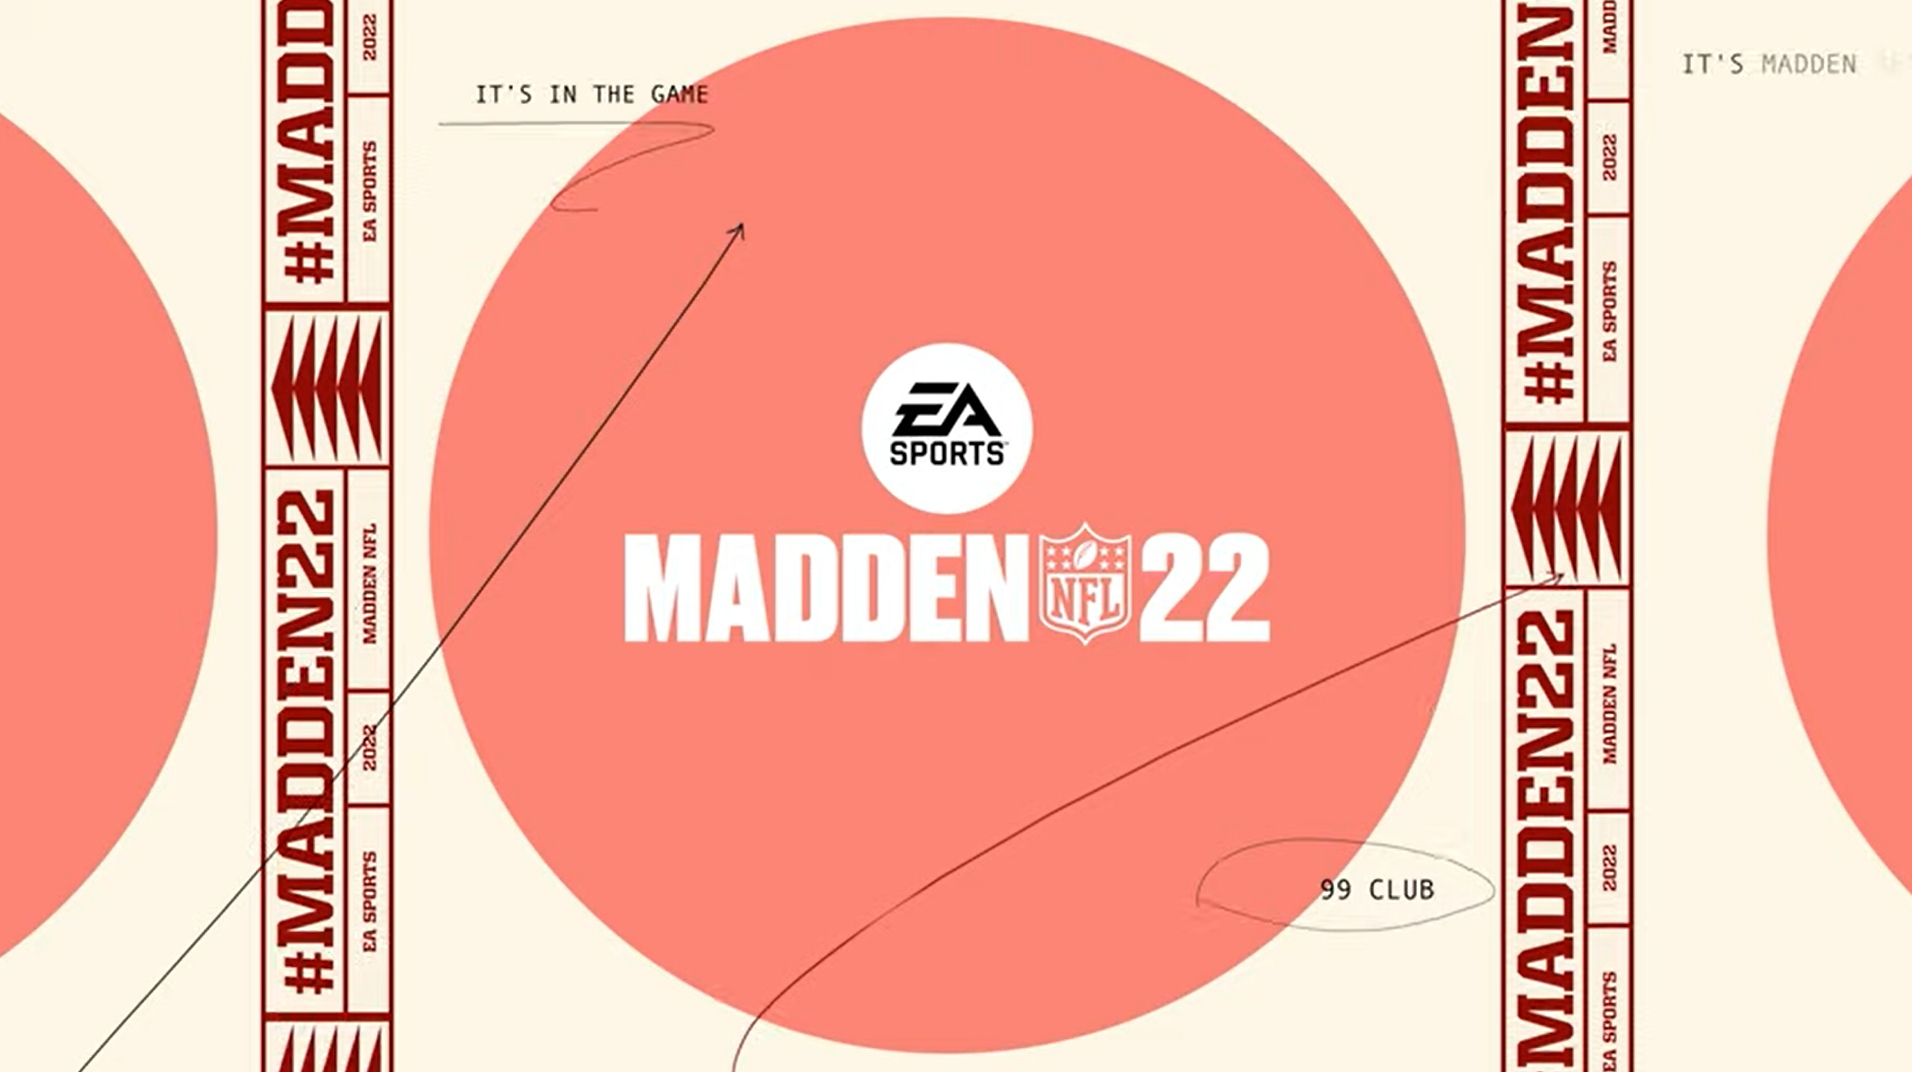 madden-nfl-22-ps5-ps4-news-reviews-videos